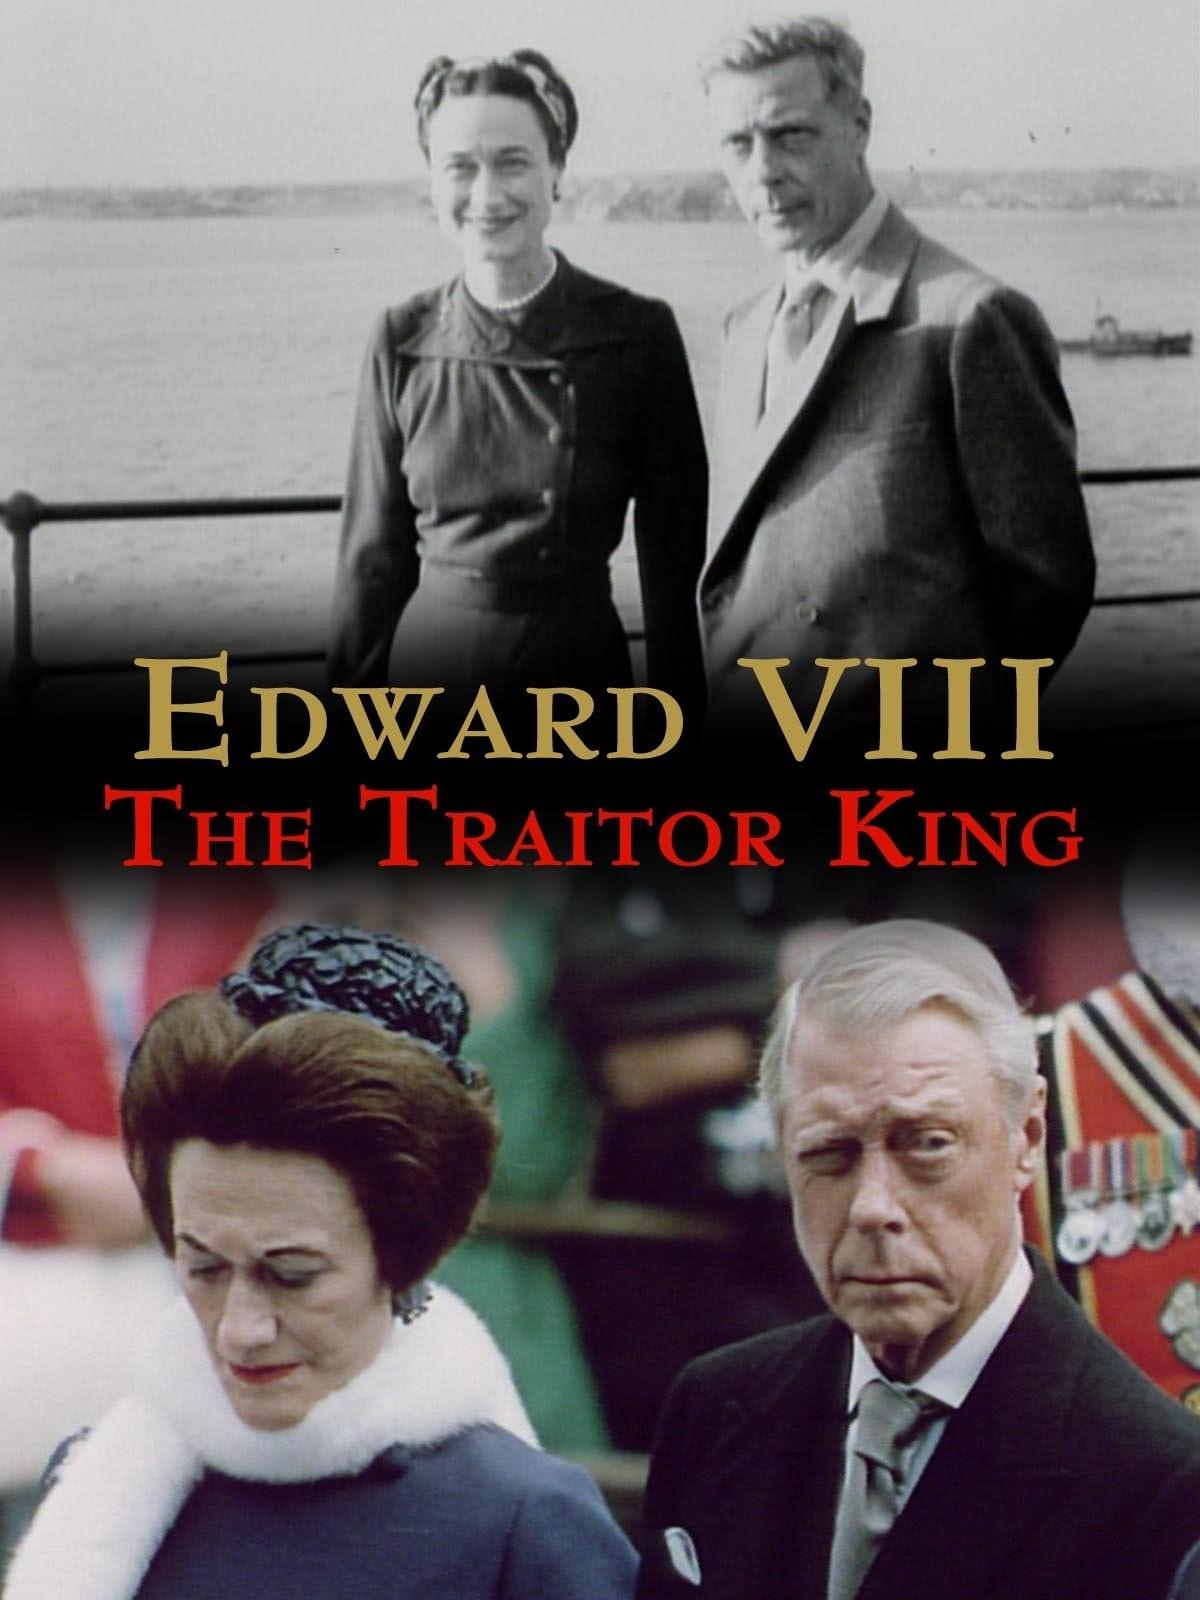 Edward VIII: The Traitor King (1996)